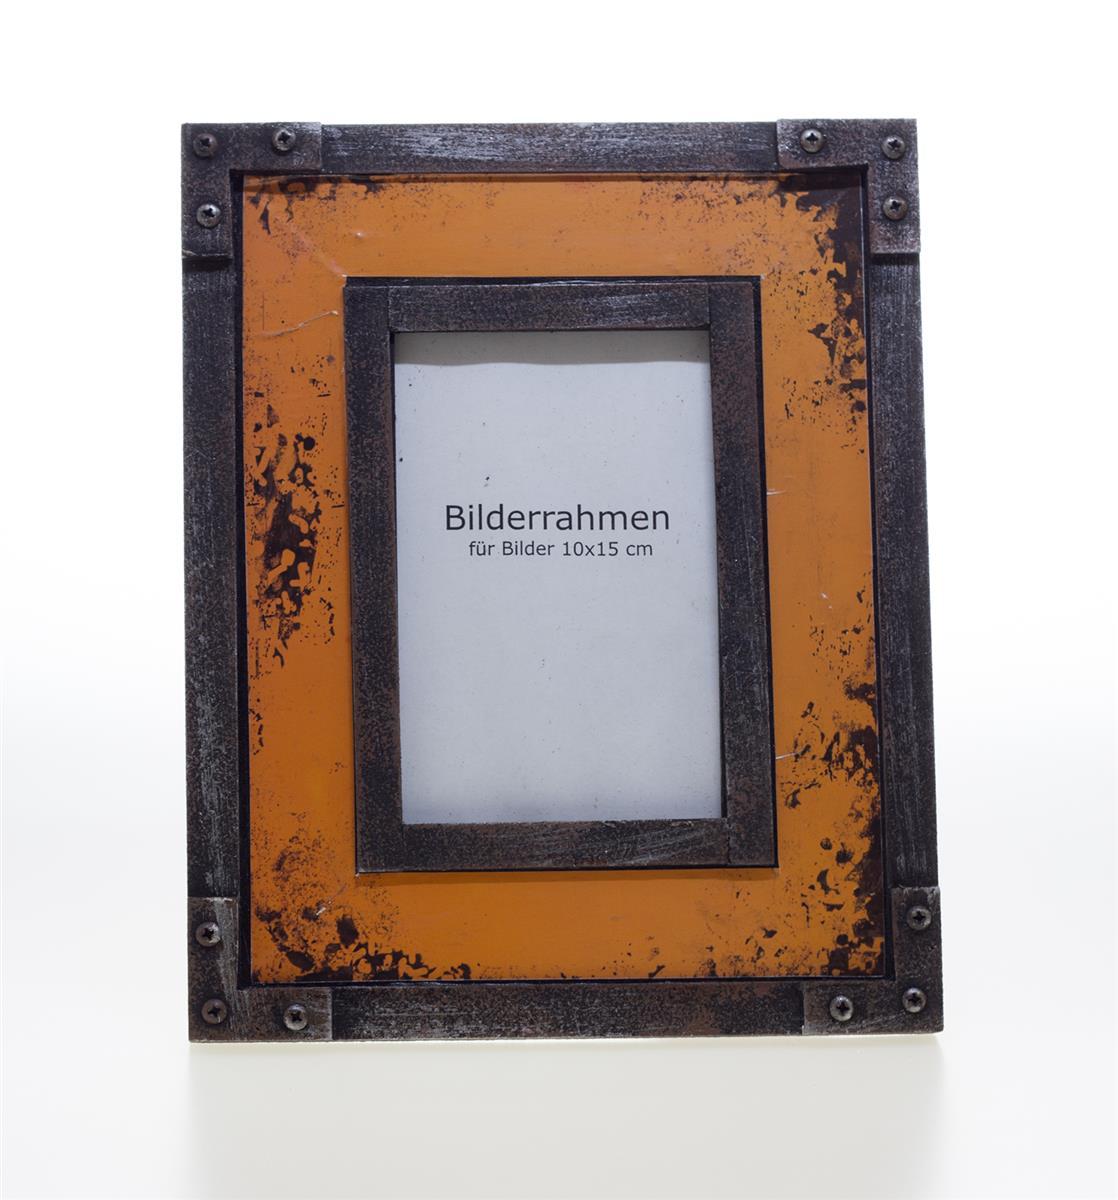 bilderrahmen vintage fotorahmen holz rahmen metall 10x15cm, Moderne